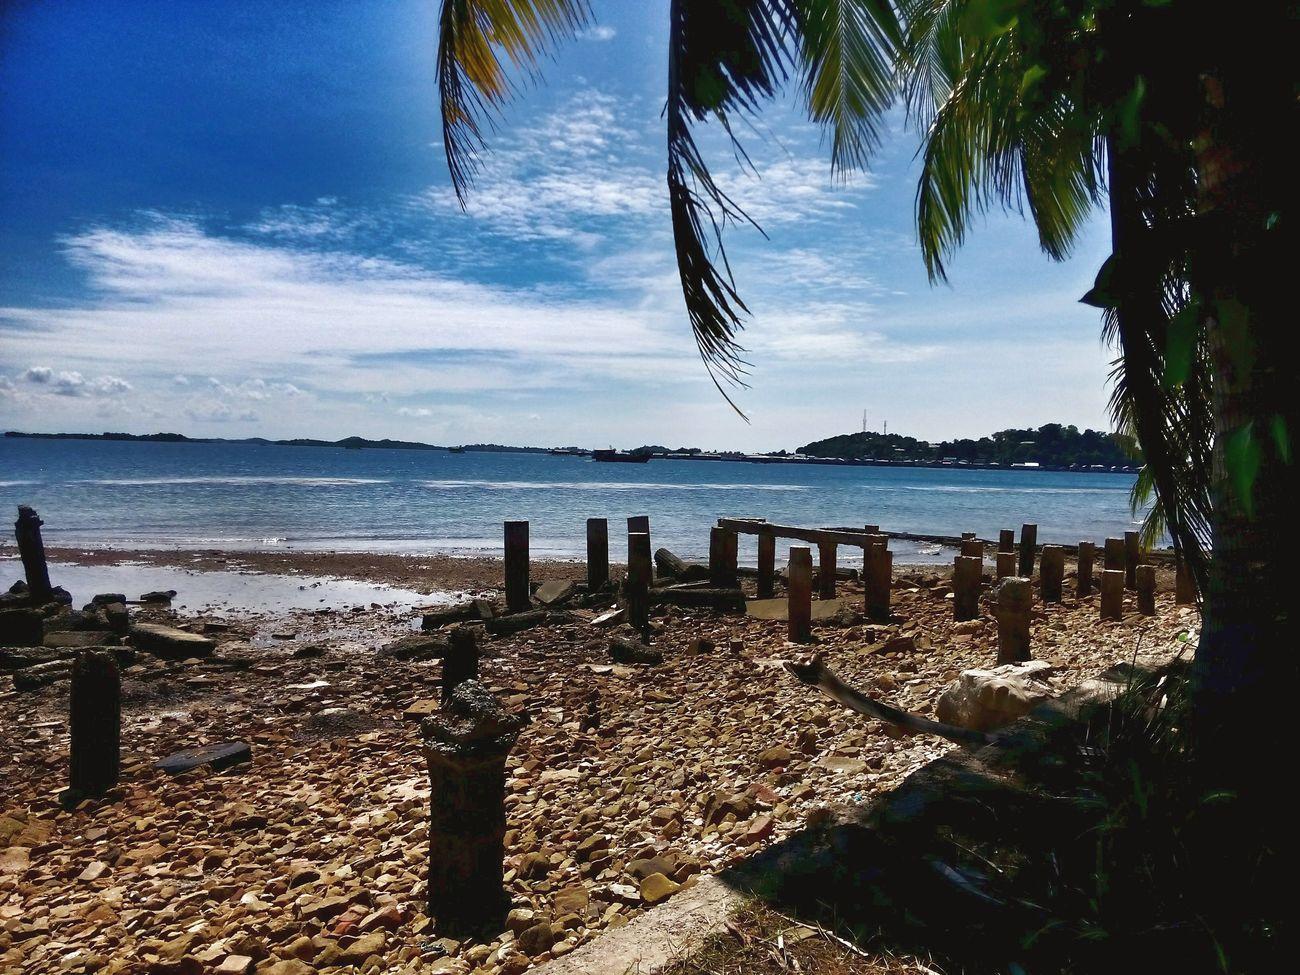 Lost Island Enjoying Life Journey EyeEm Indonesia Exploreindonesia INDONESIA My Life My Adventure Taking Photos Hanging Out Landscape